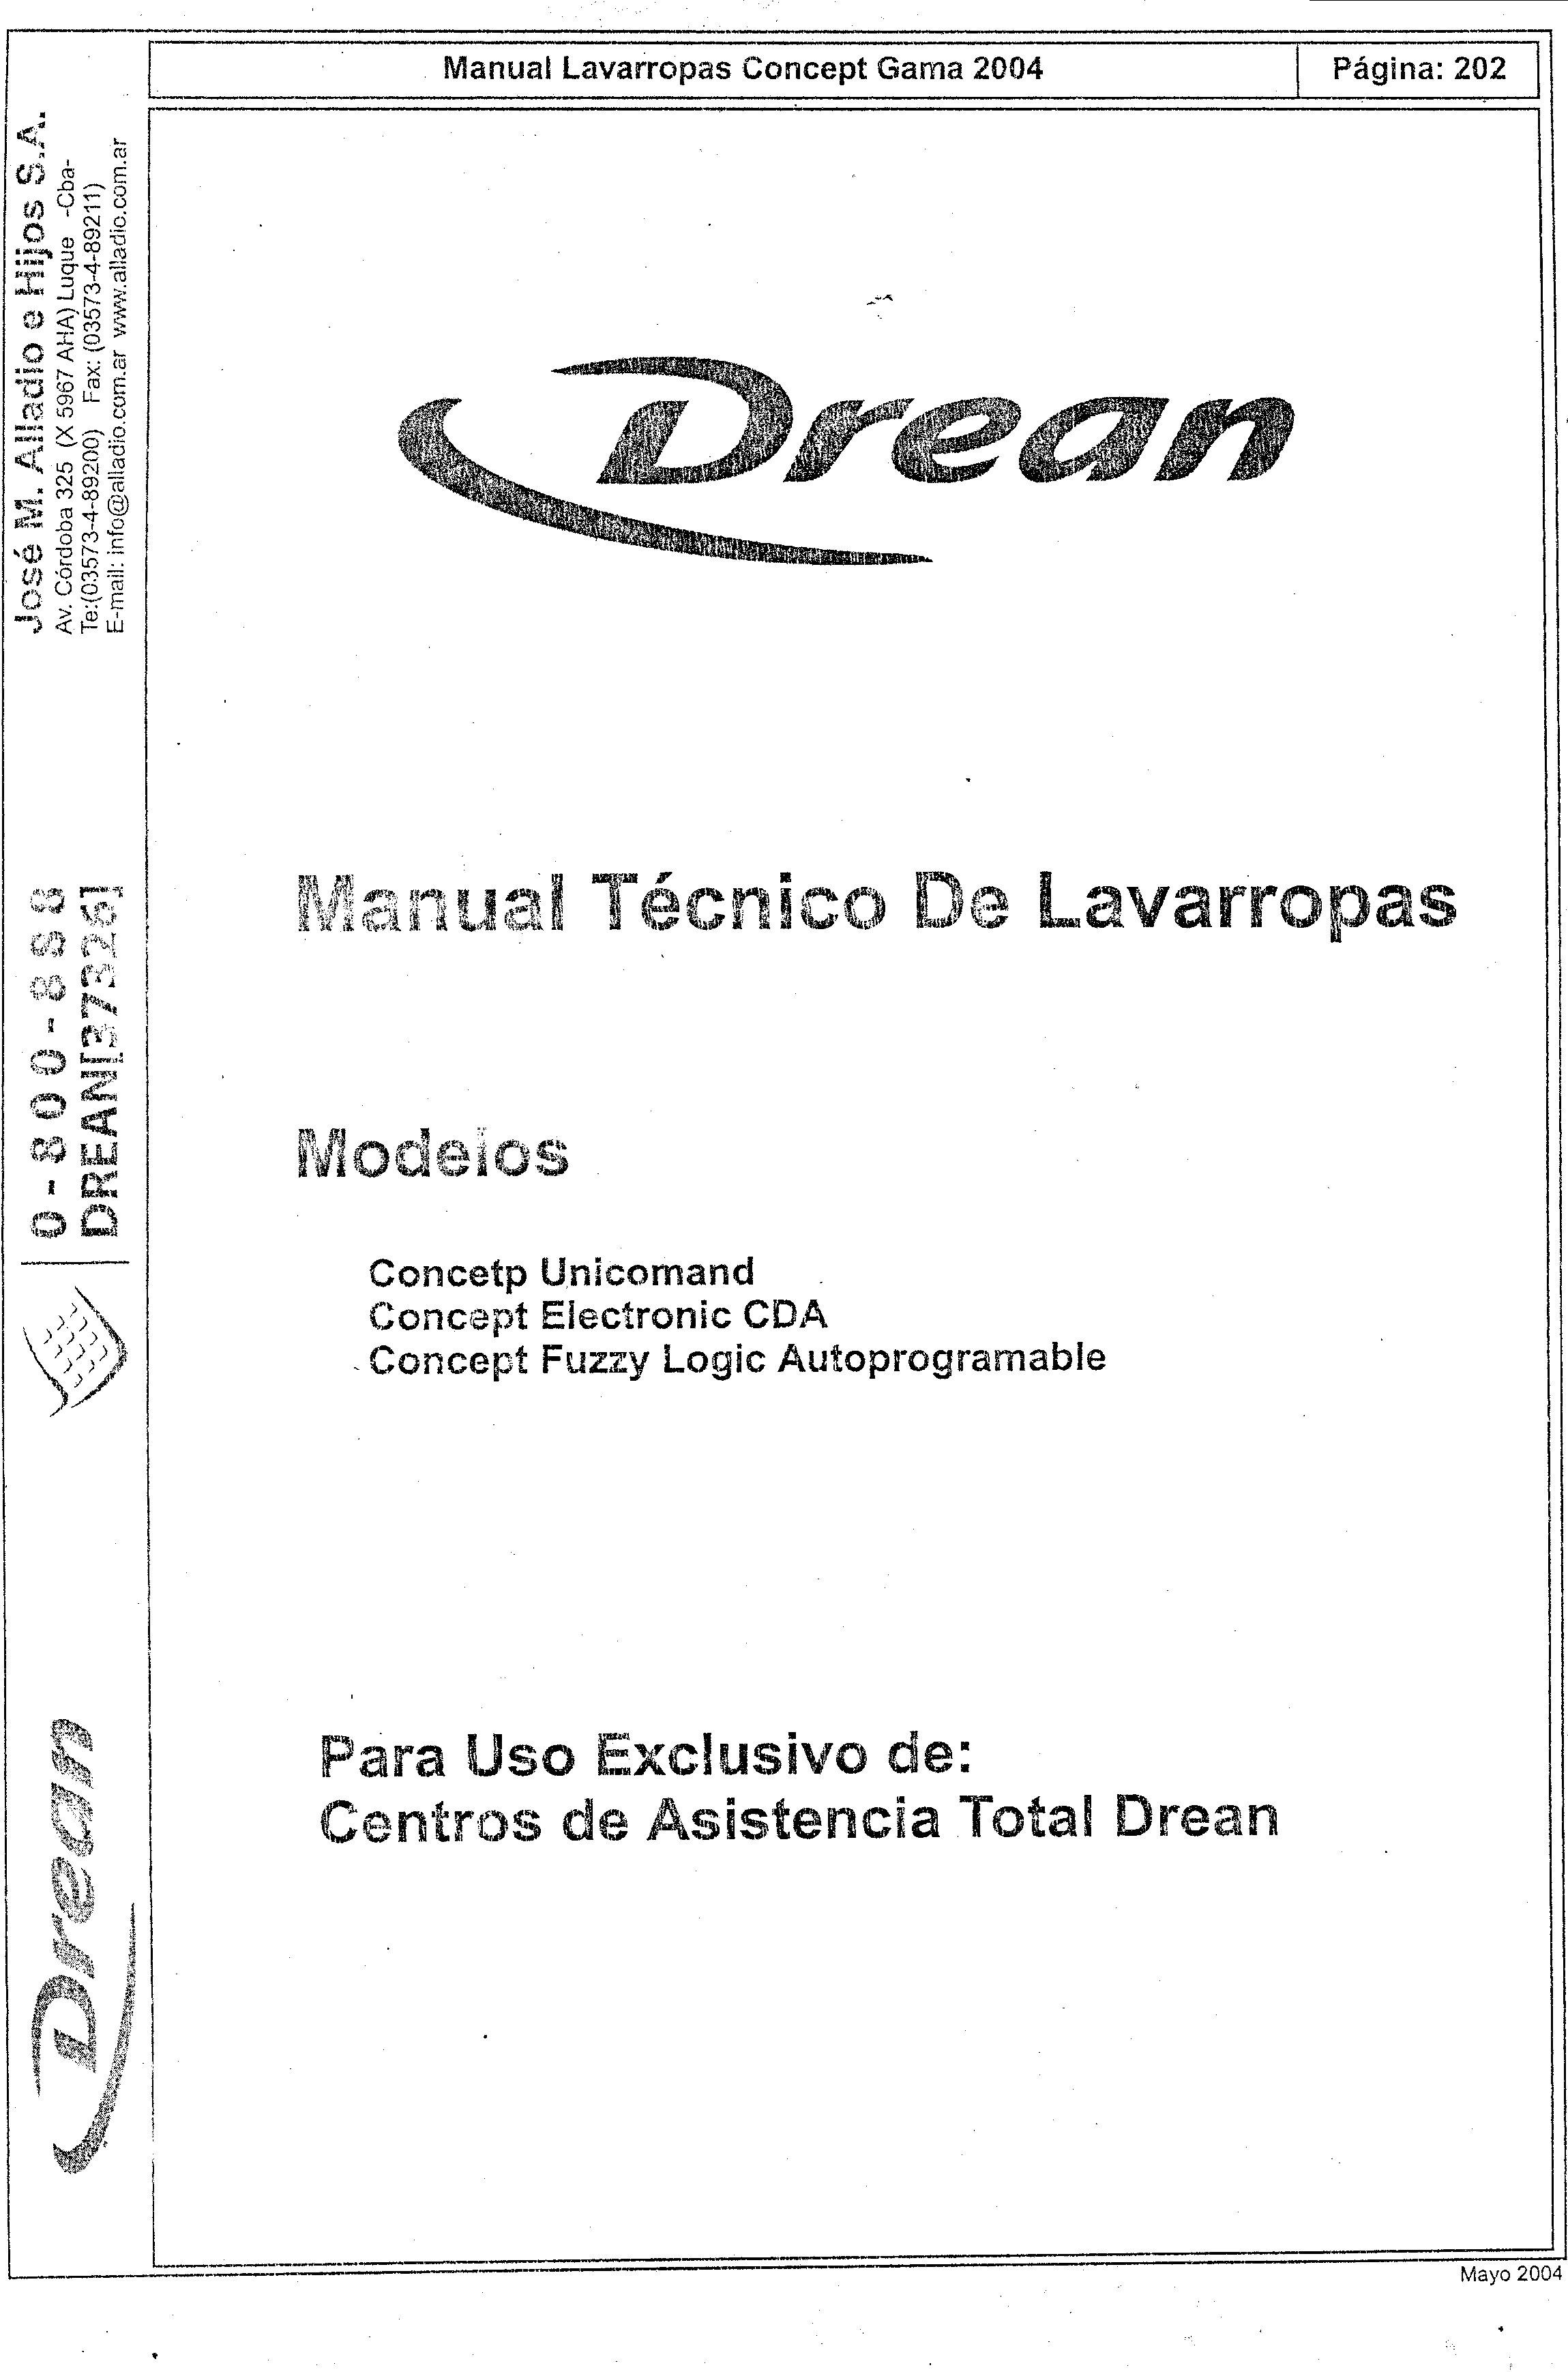 Drean Drean Unicommand 202 Jpg Diagramas De Lavarropas Secadoras  U2013 Diagramasde Com  U2013 Diagramas